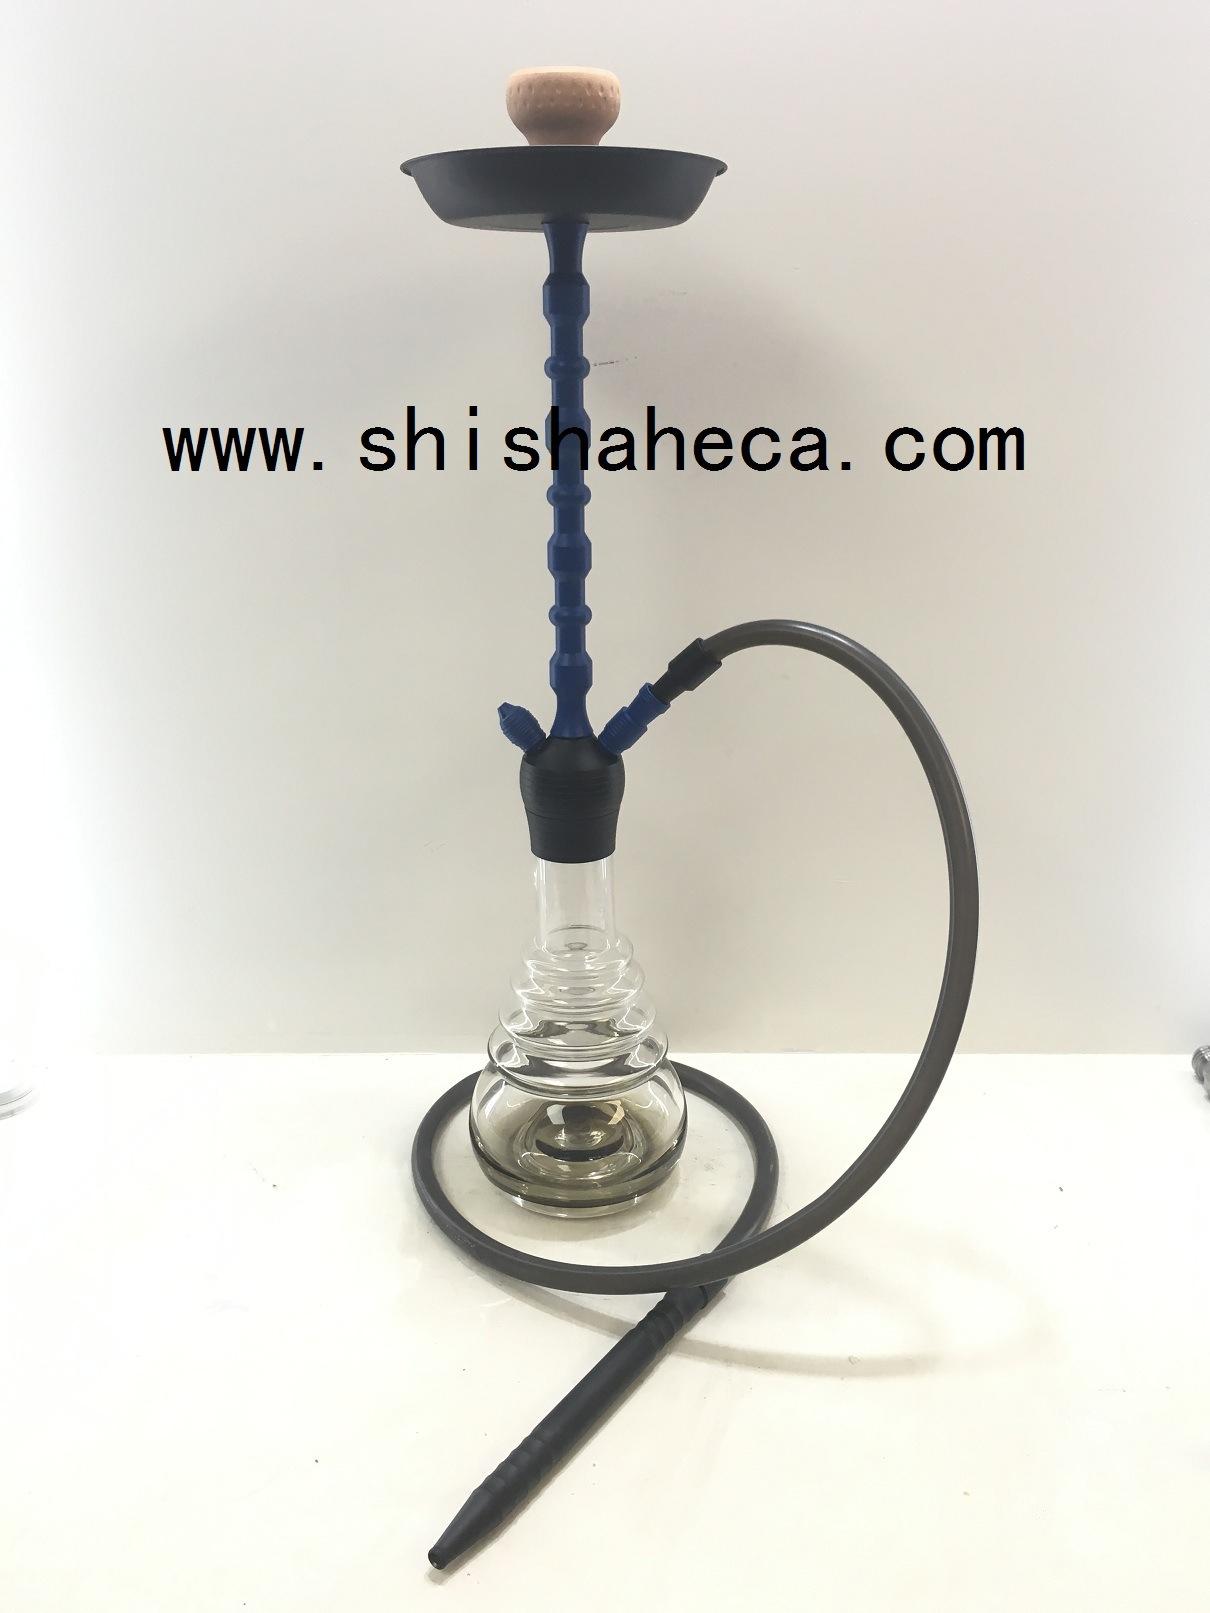 Wholesale High Quality Zinc Alloy Shisha Nargile Smoking Pipe Hookah